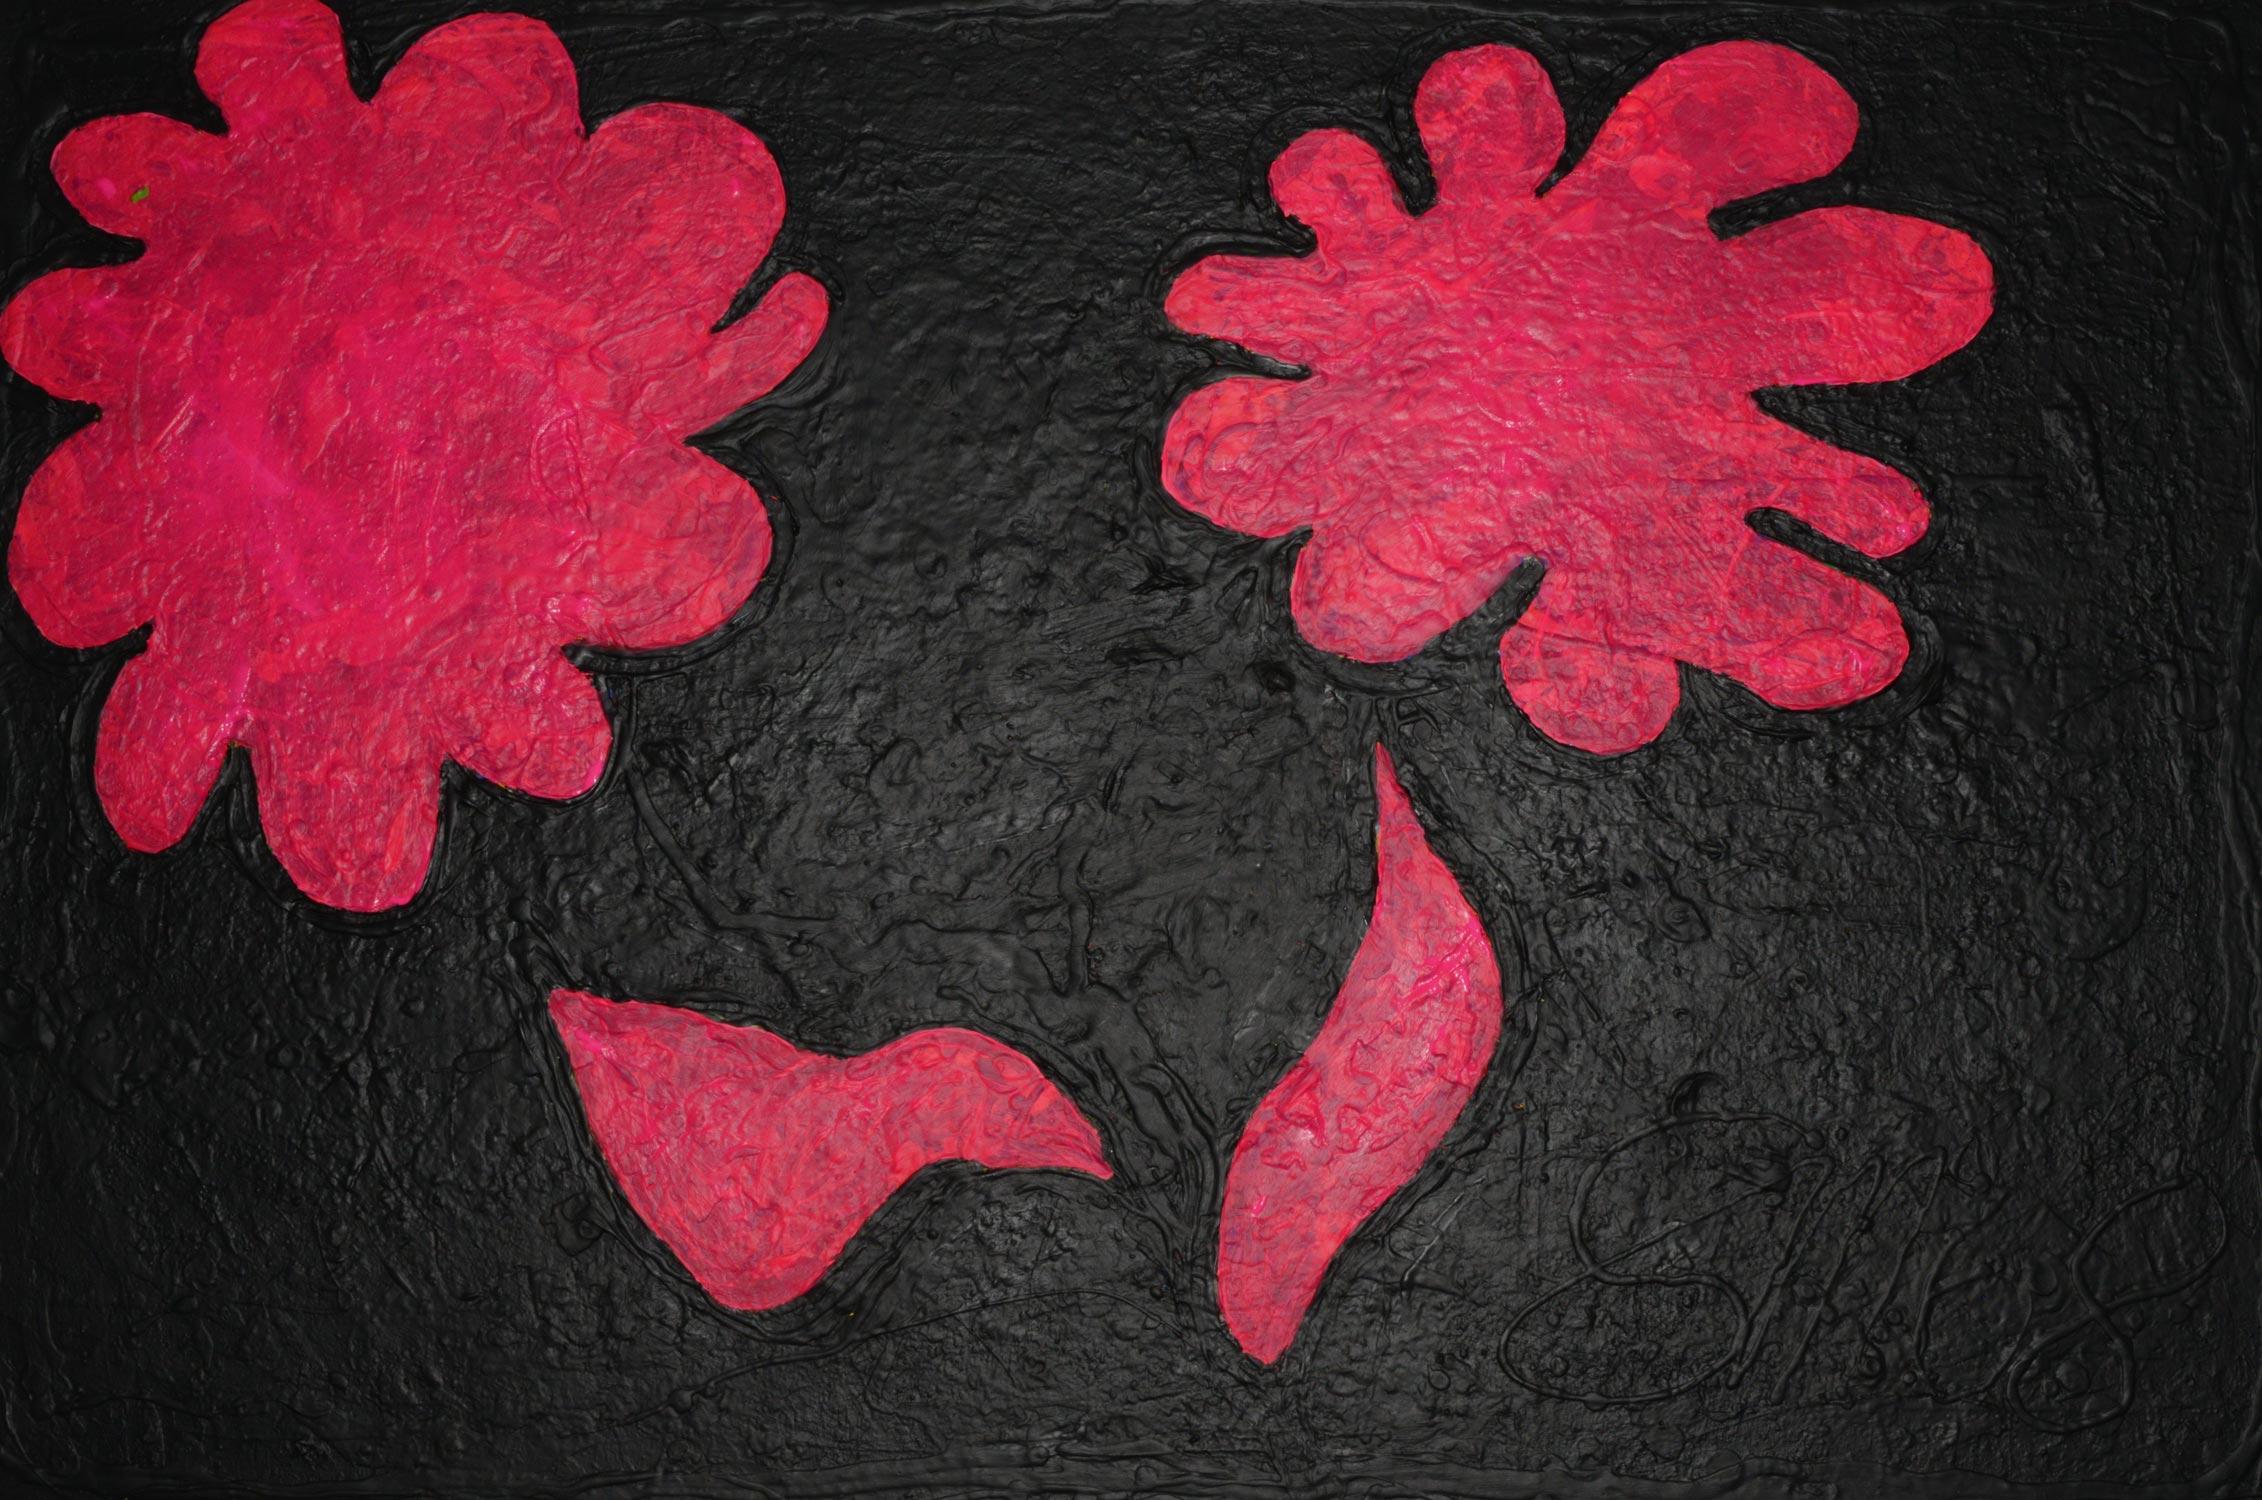 Sonnenblumen 1 | Acryl auf Leinwand